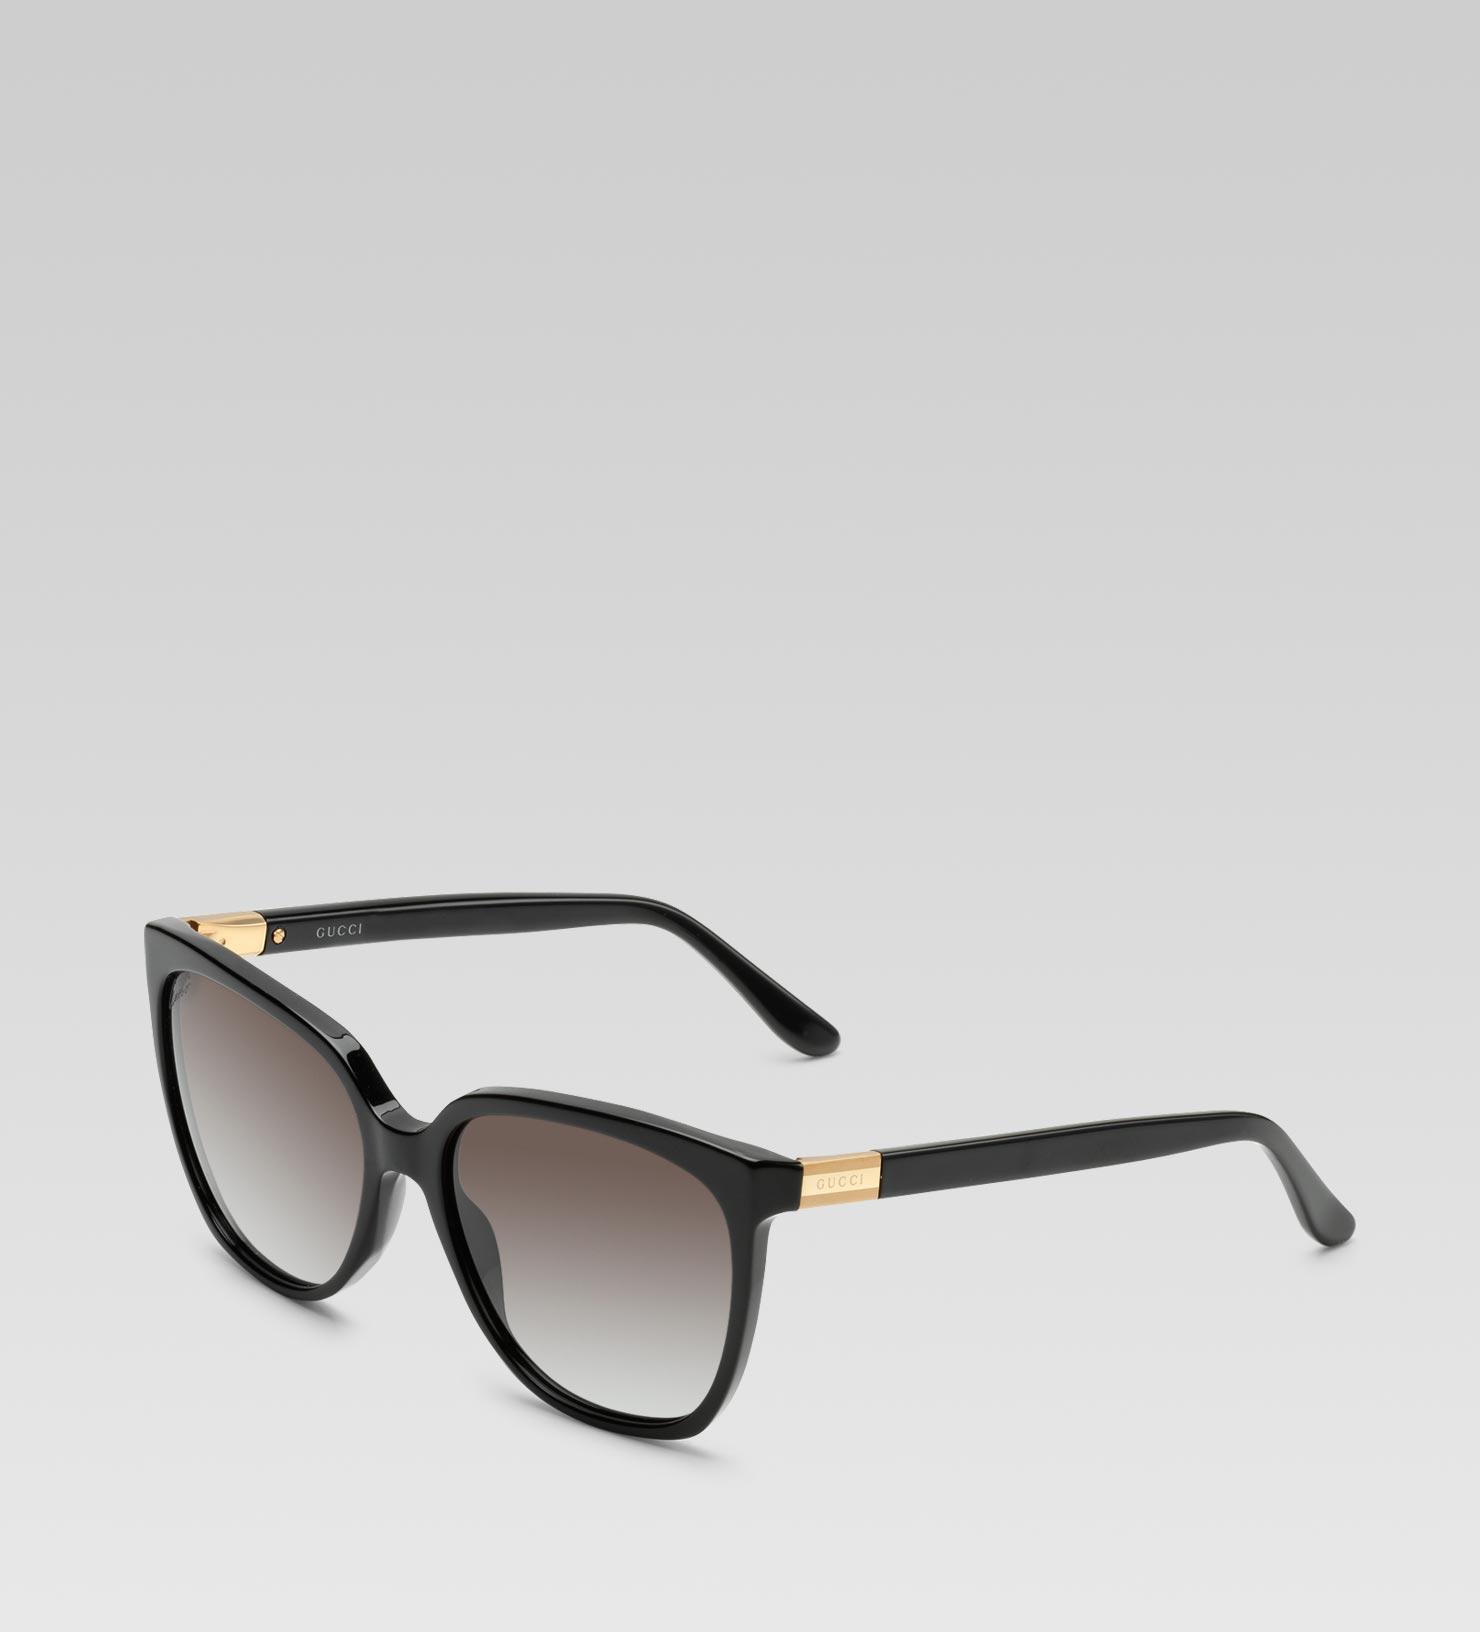 099ffabe55 Gucci Medium Square Frame Sunglasses with Gucci Web Plaque Logo and ...